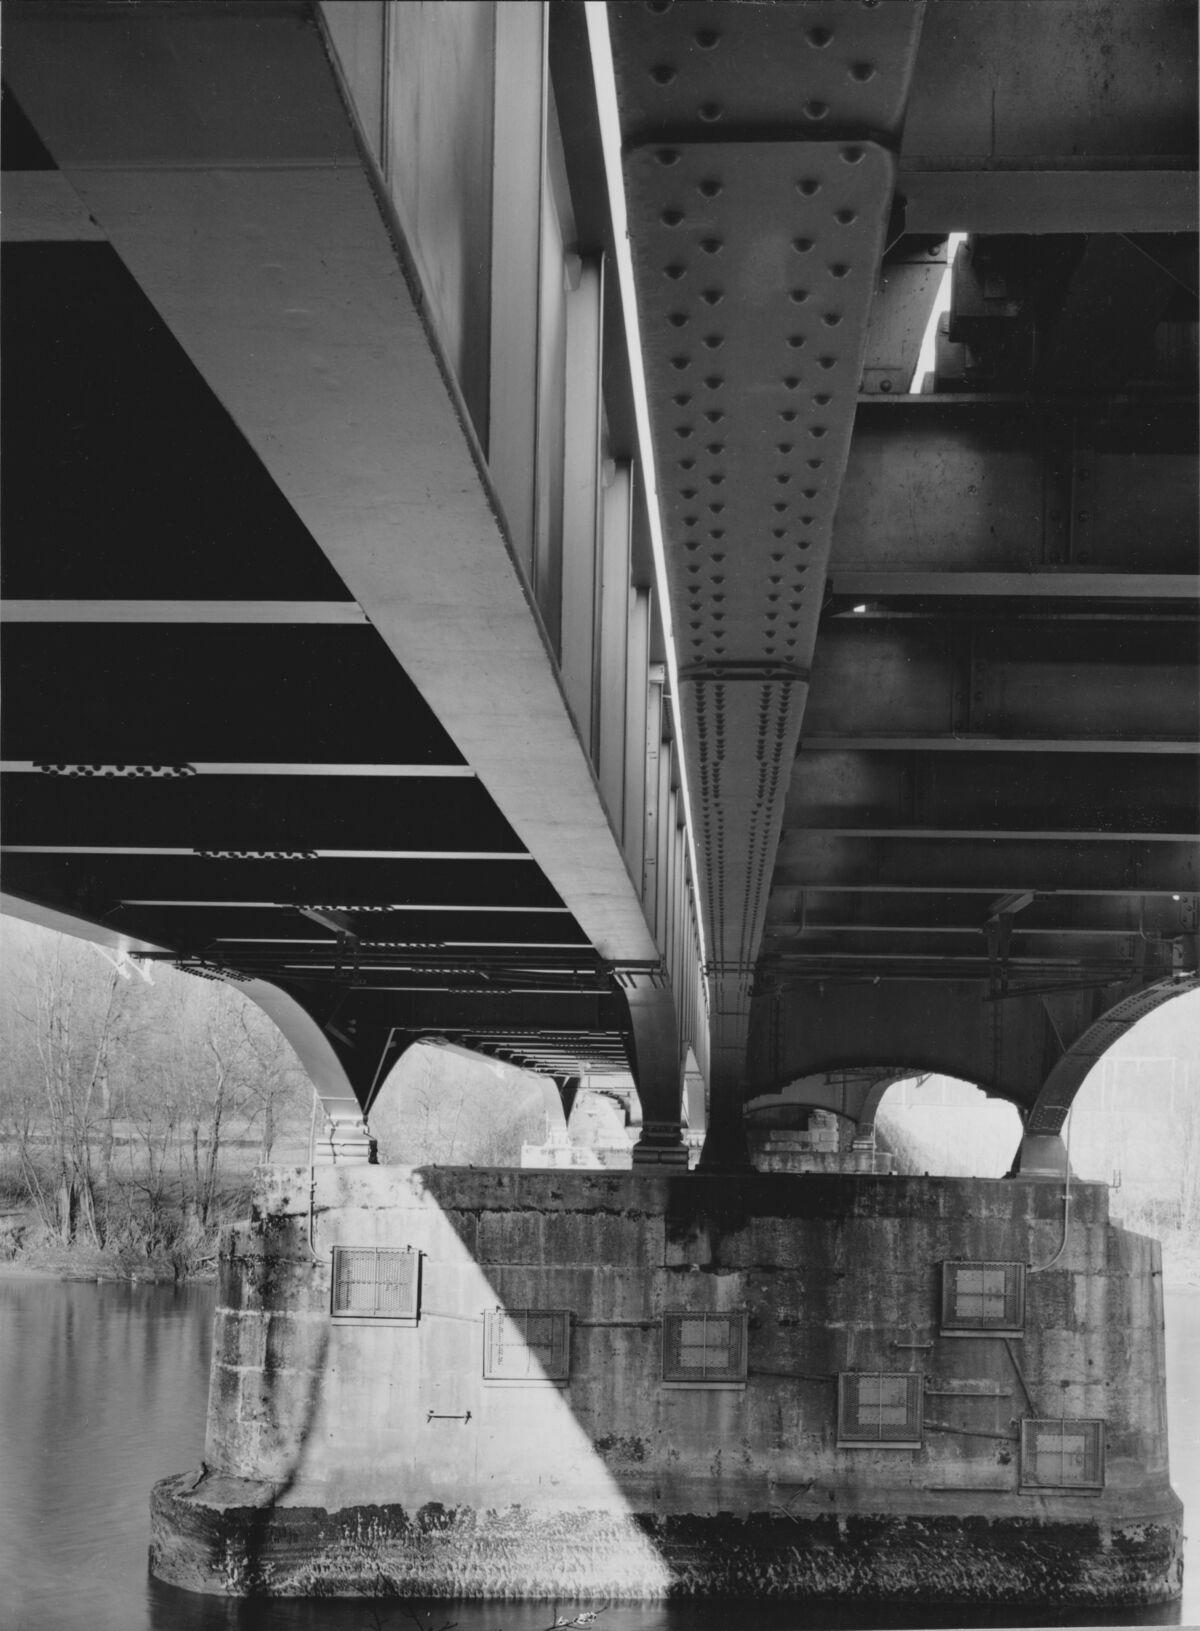 GFA 20/135.211: Stahl- und Brückenbau: Aarebrücke Wangen